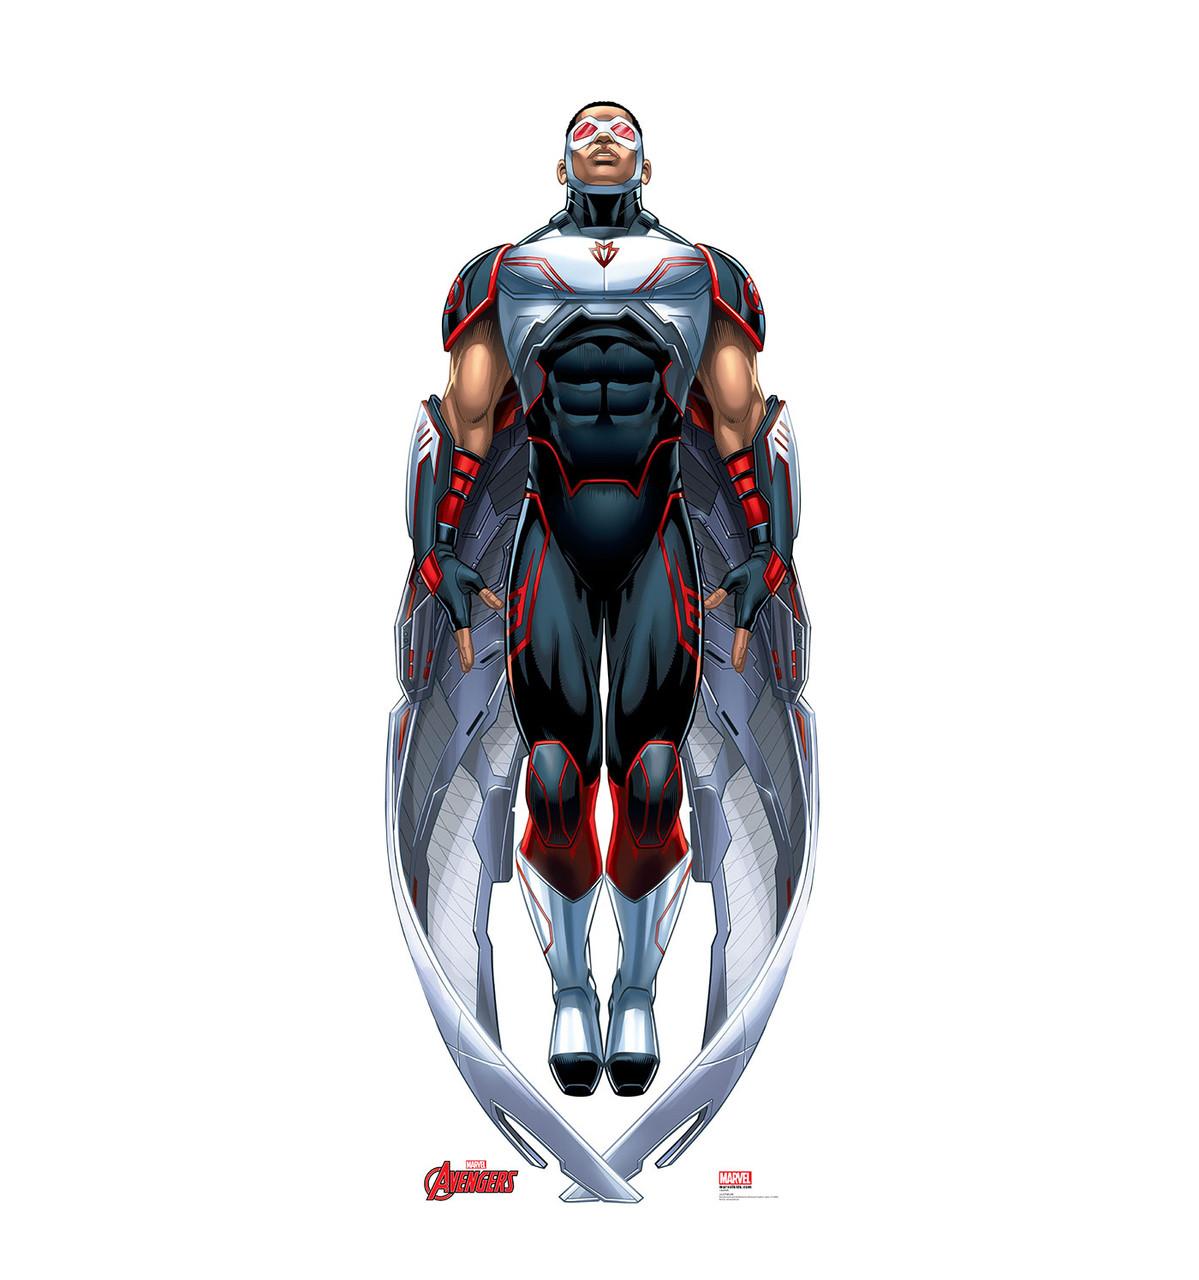 Life-size Falcon (Avengers) Cardboard Standup | Cardboard Cutout